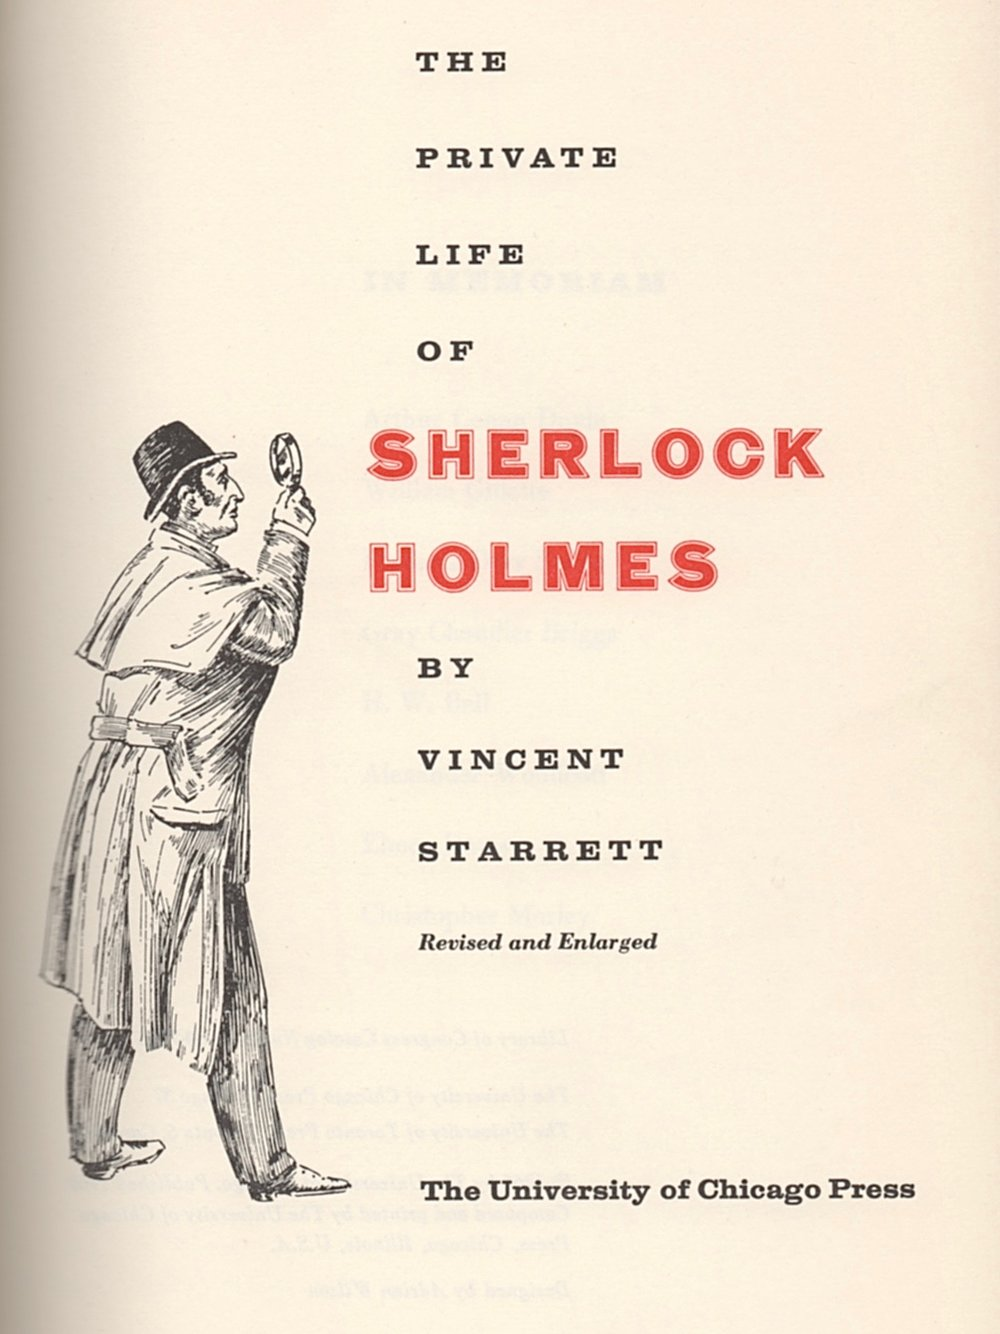 TPLOSH 1960 1st title page.jpg